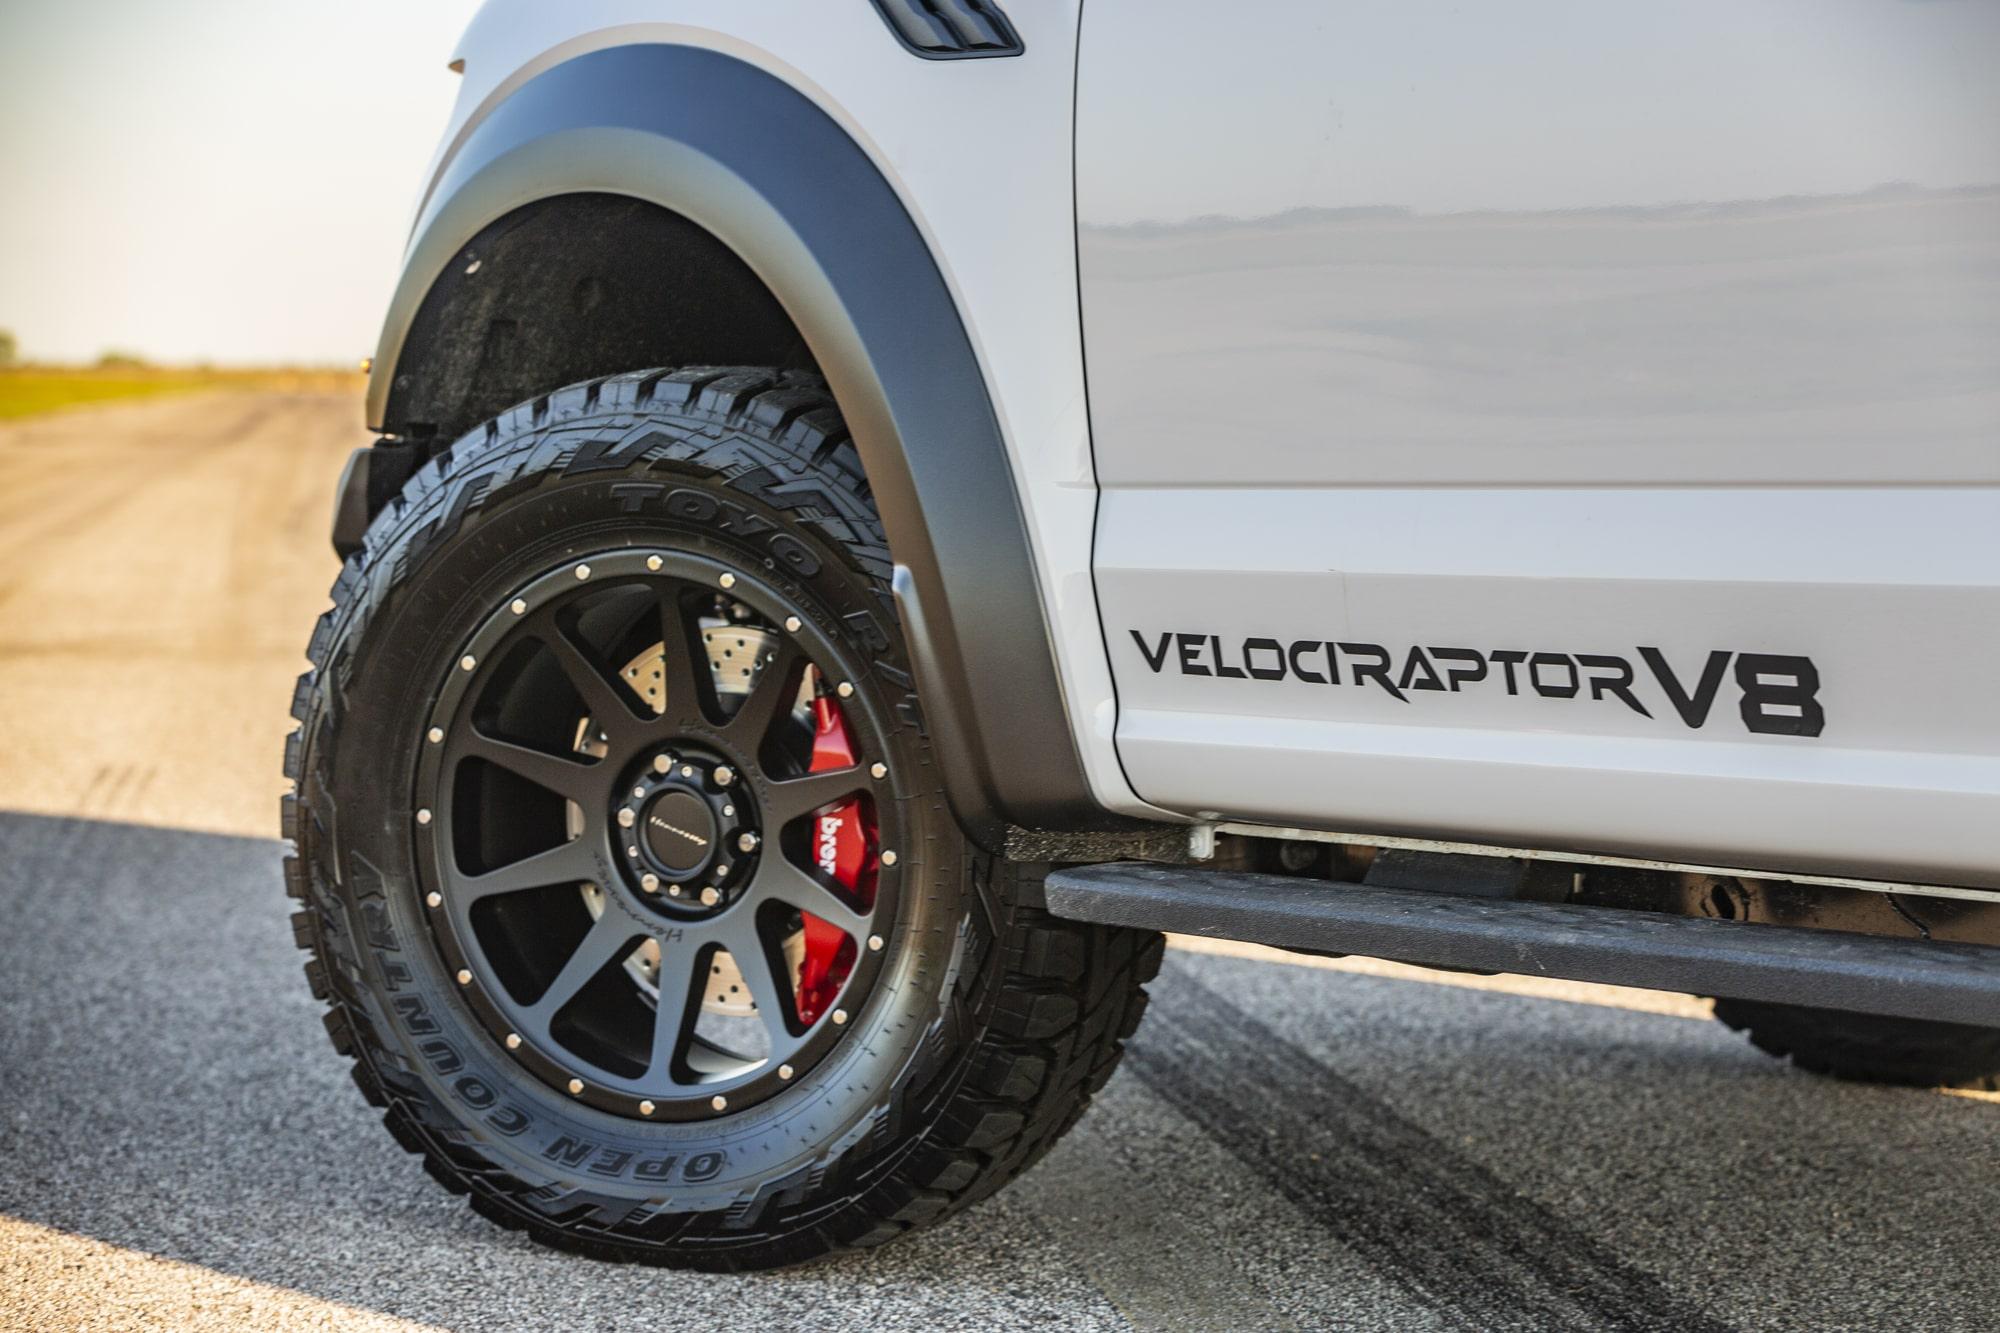 Hennessey Velociraptor V8 Conversion White 2019 Hennessey-Velociraptor-V8-White-Sunset_05-min